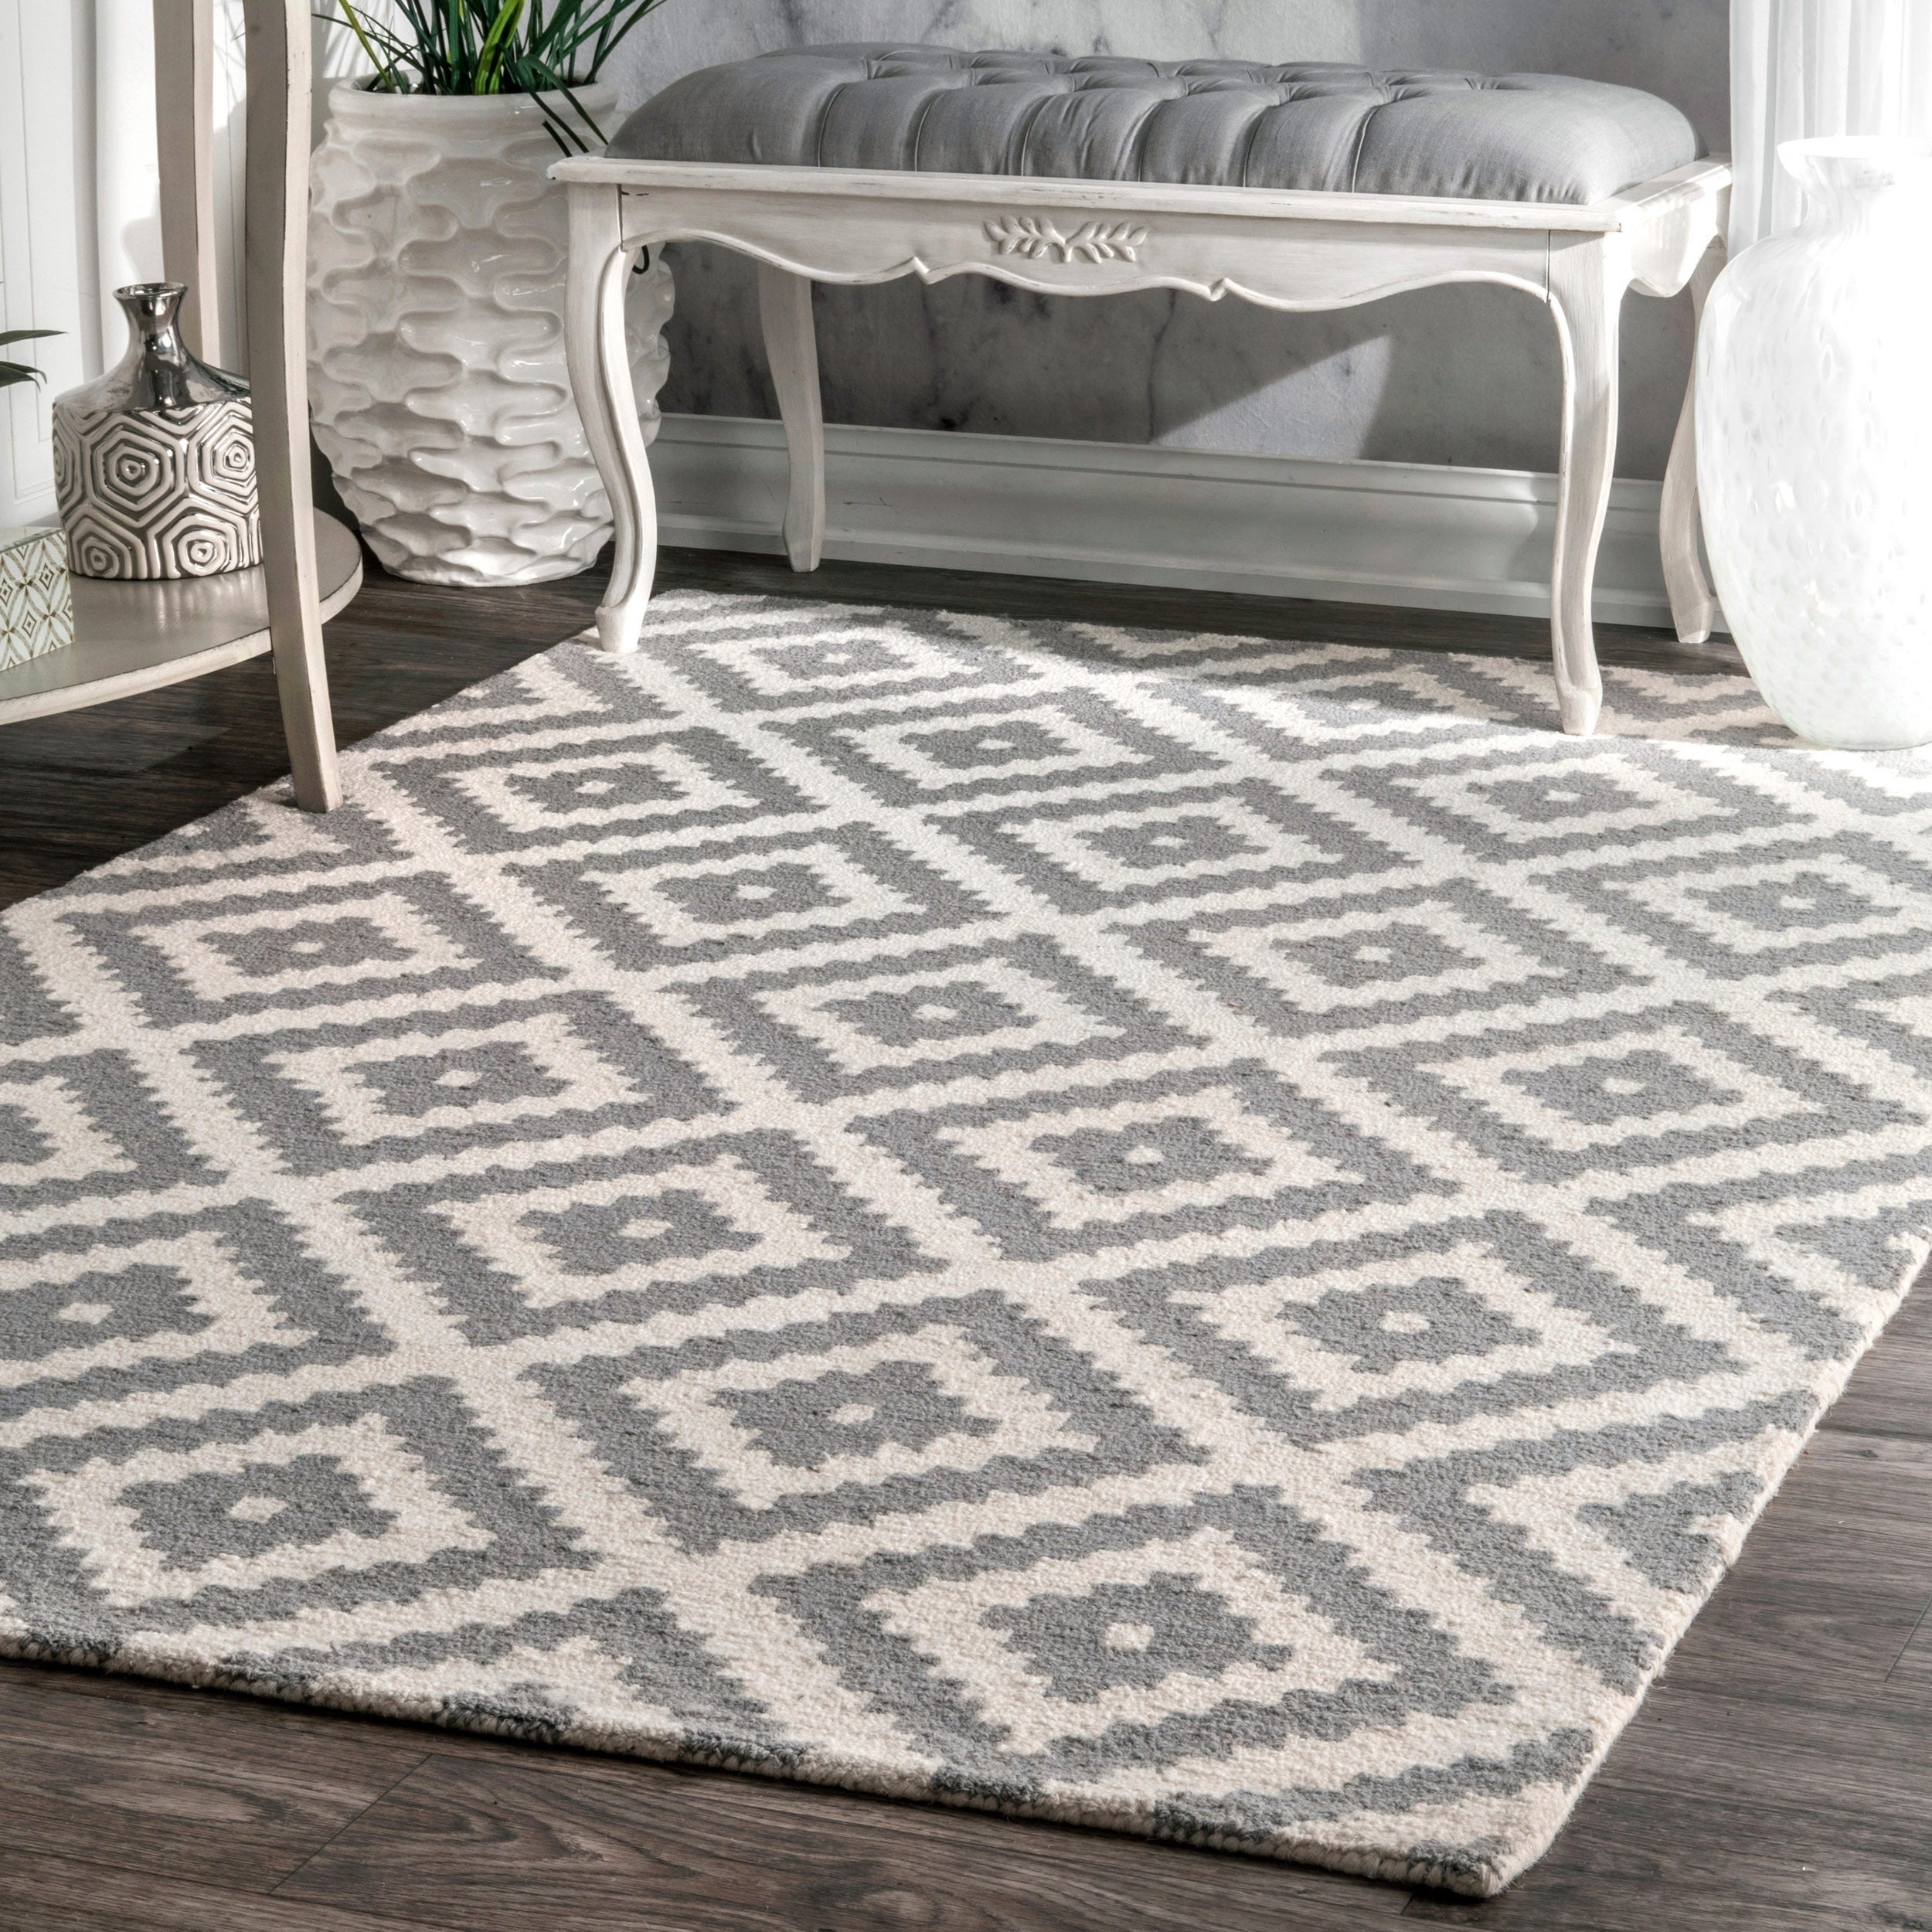 gray moroccan x com kitchen dp rugshop turquoise indoor dining cozy trellis shag amazon rug area